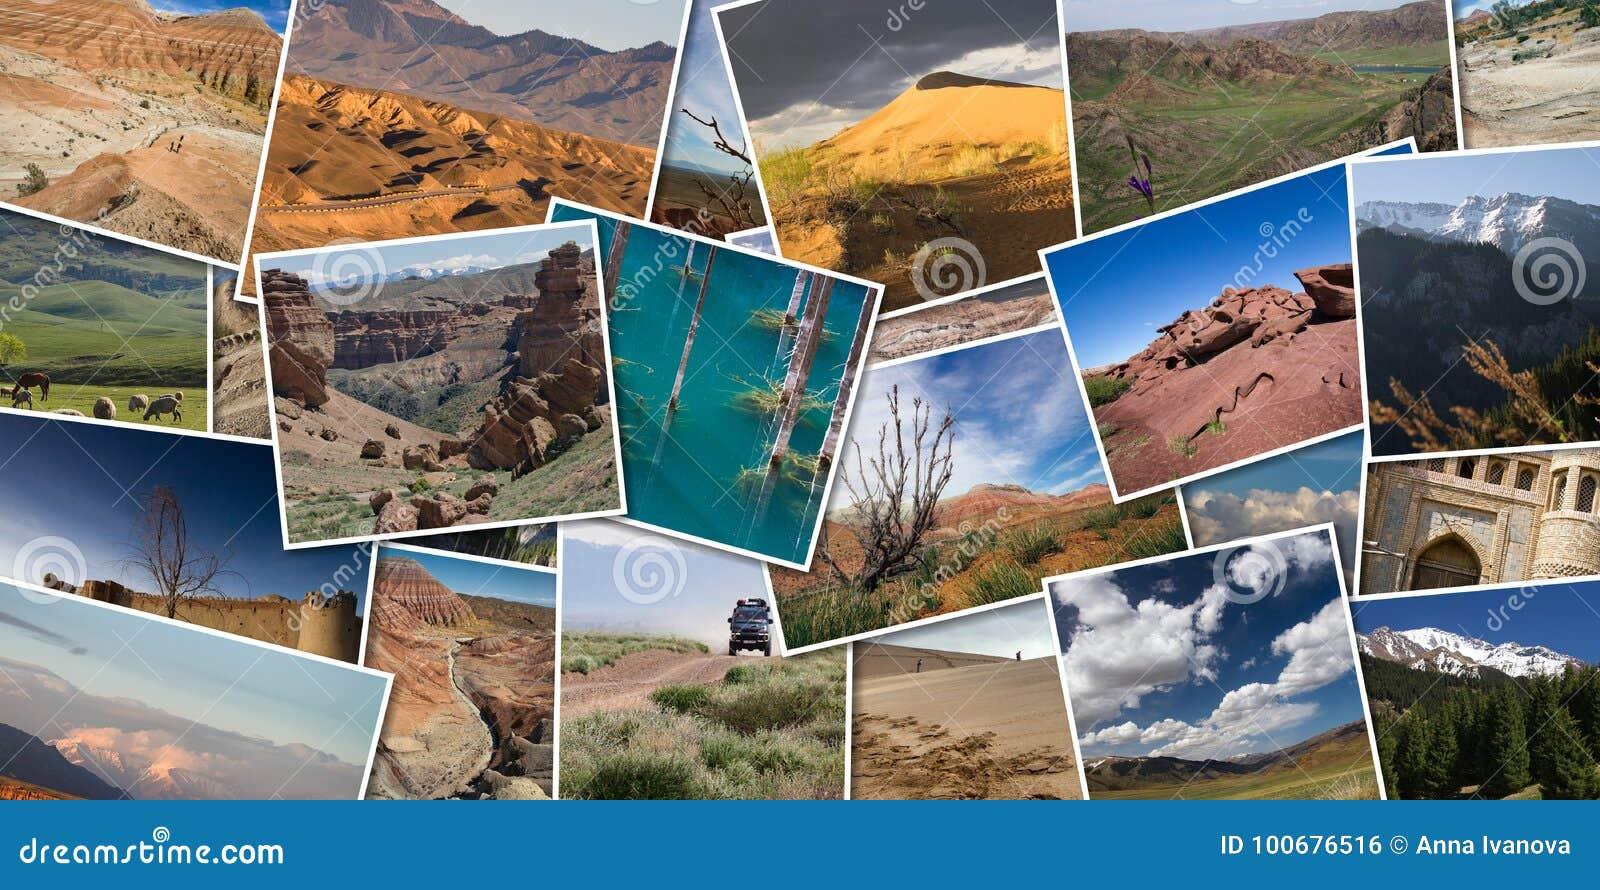 Panoramnyj Kollazh Foto Prirody Kazahstana Landshaft M Stokovoe Foto